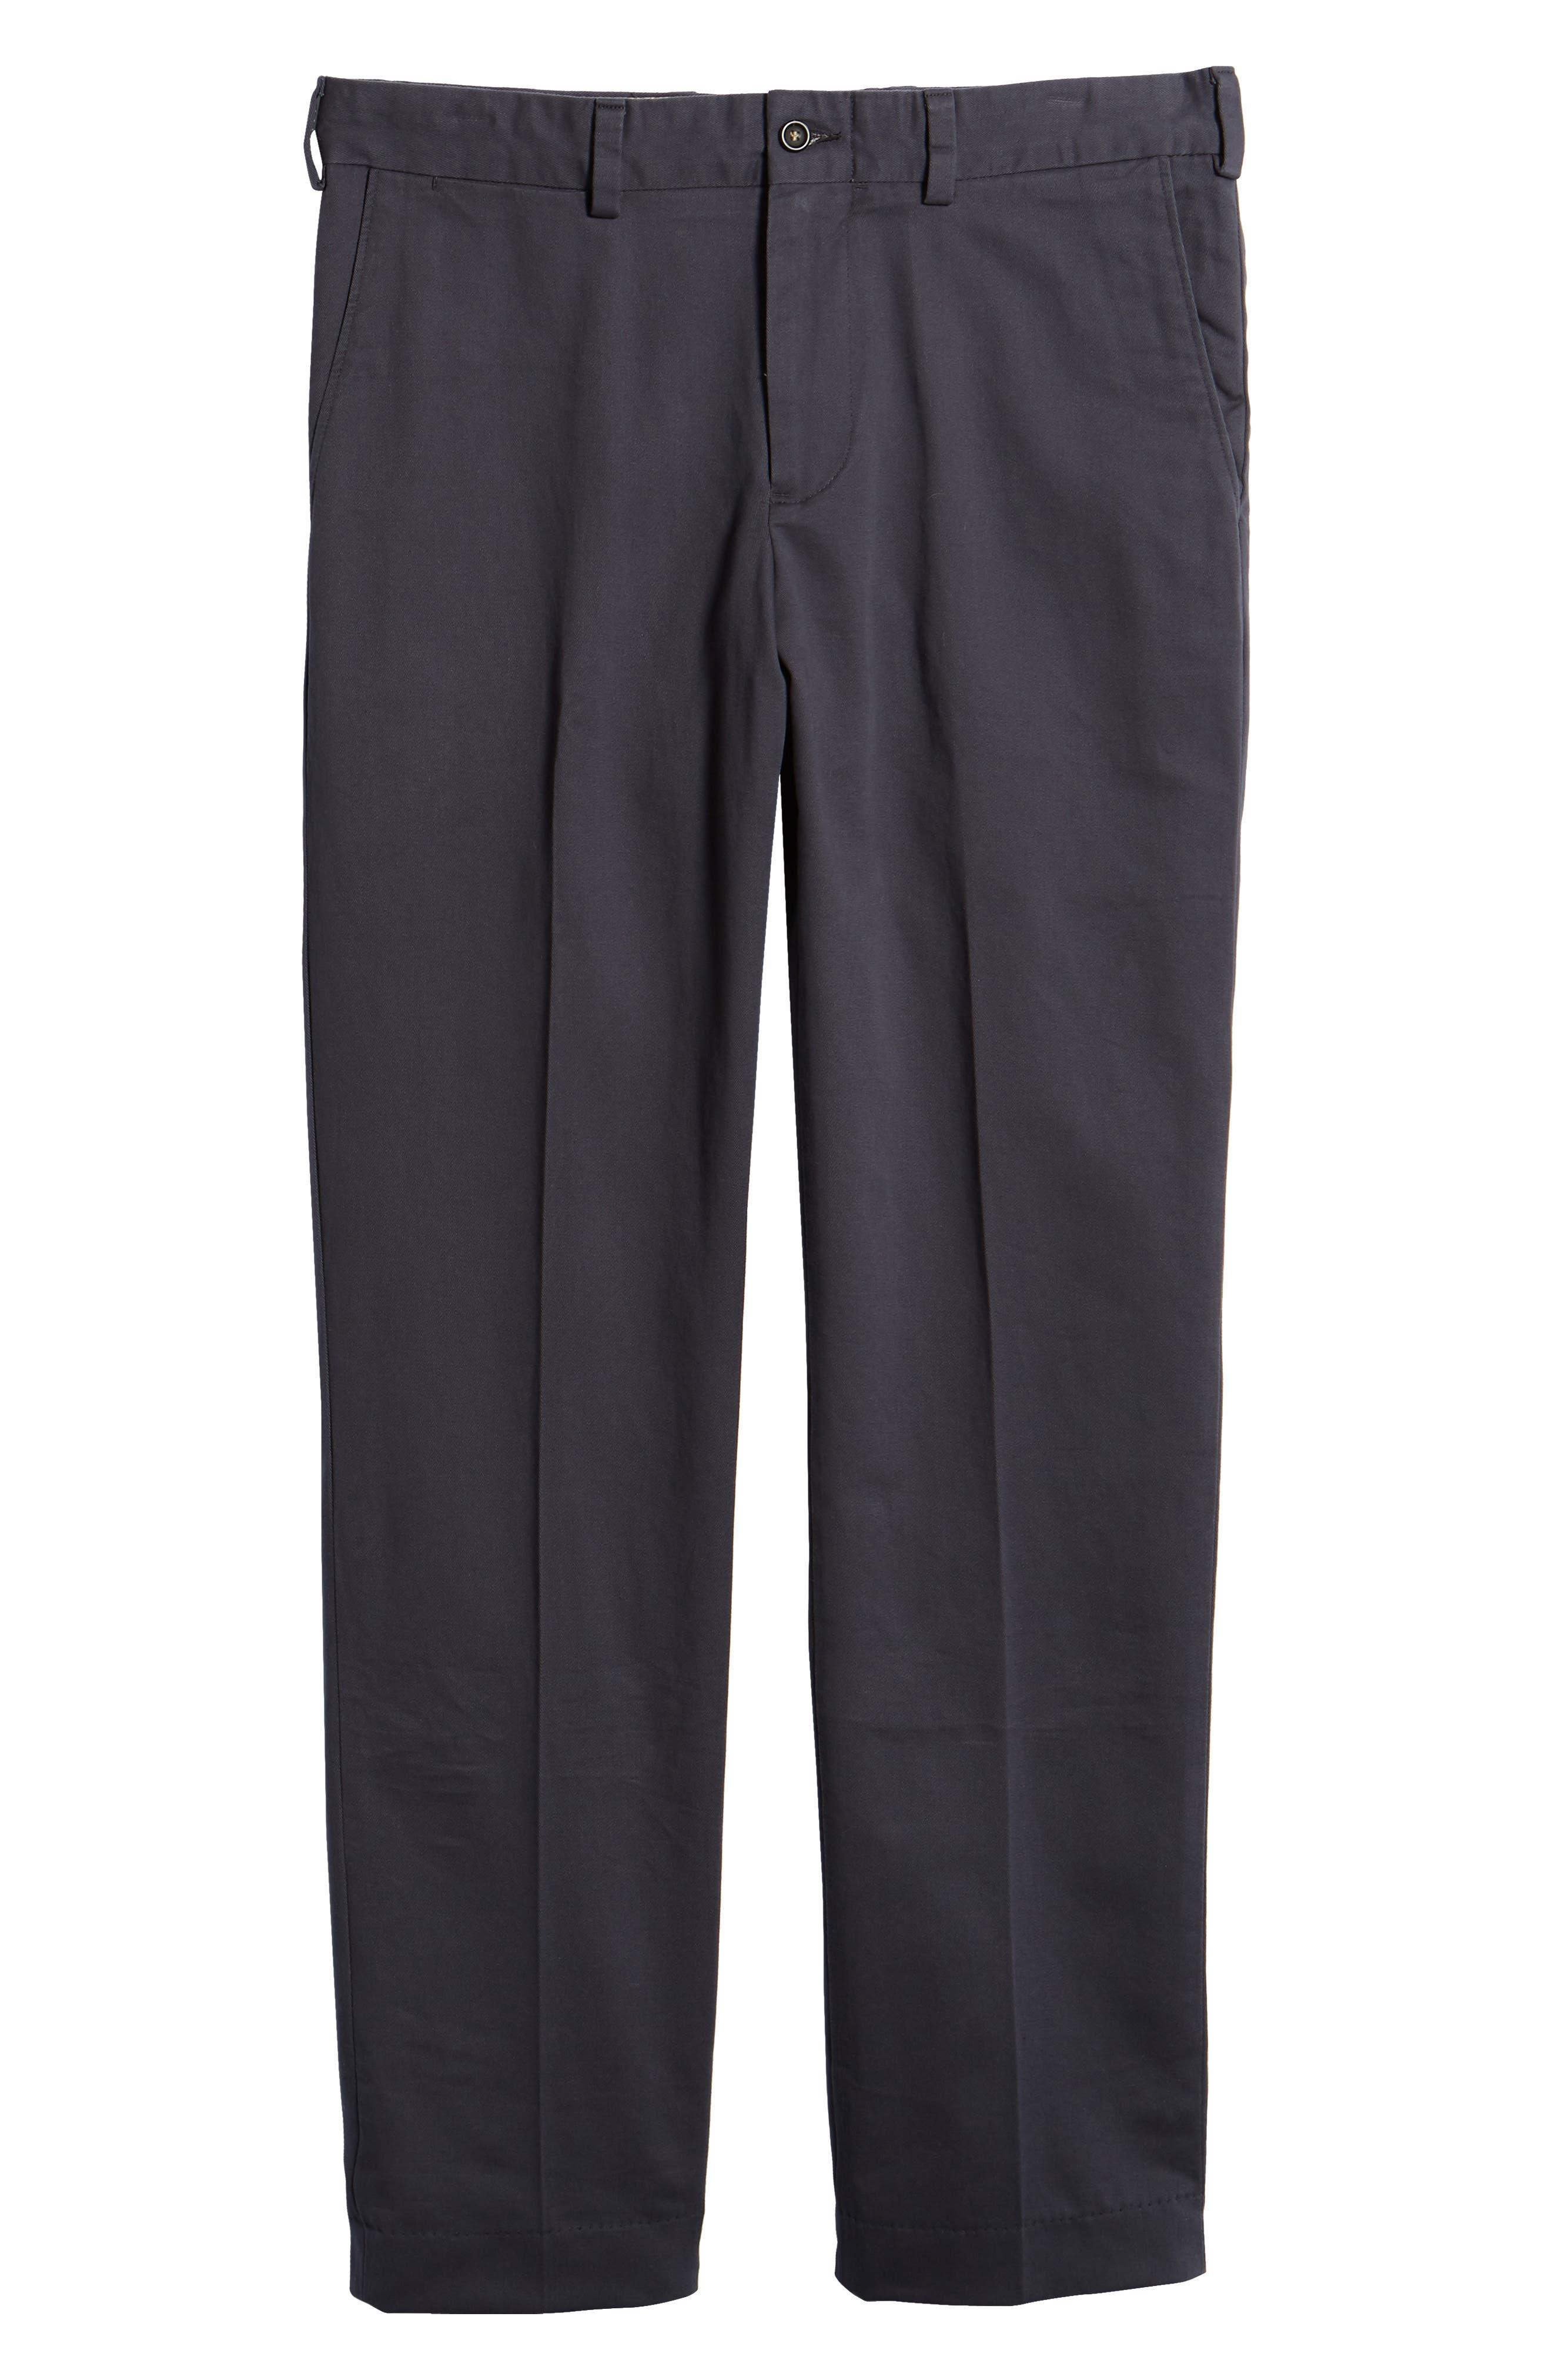 Straight Fit Vintage Twill Pants,                             Alternate thumbnail 6, color,                             410